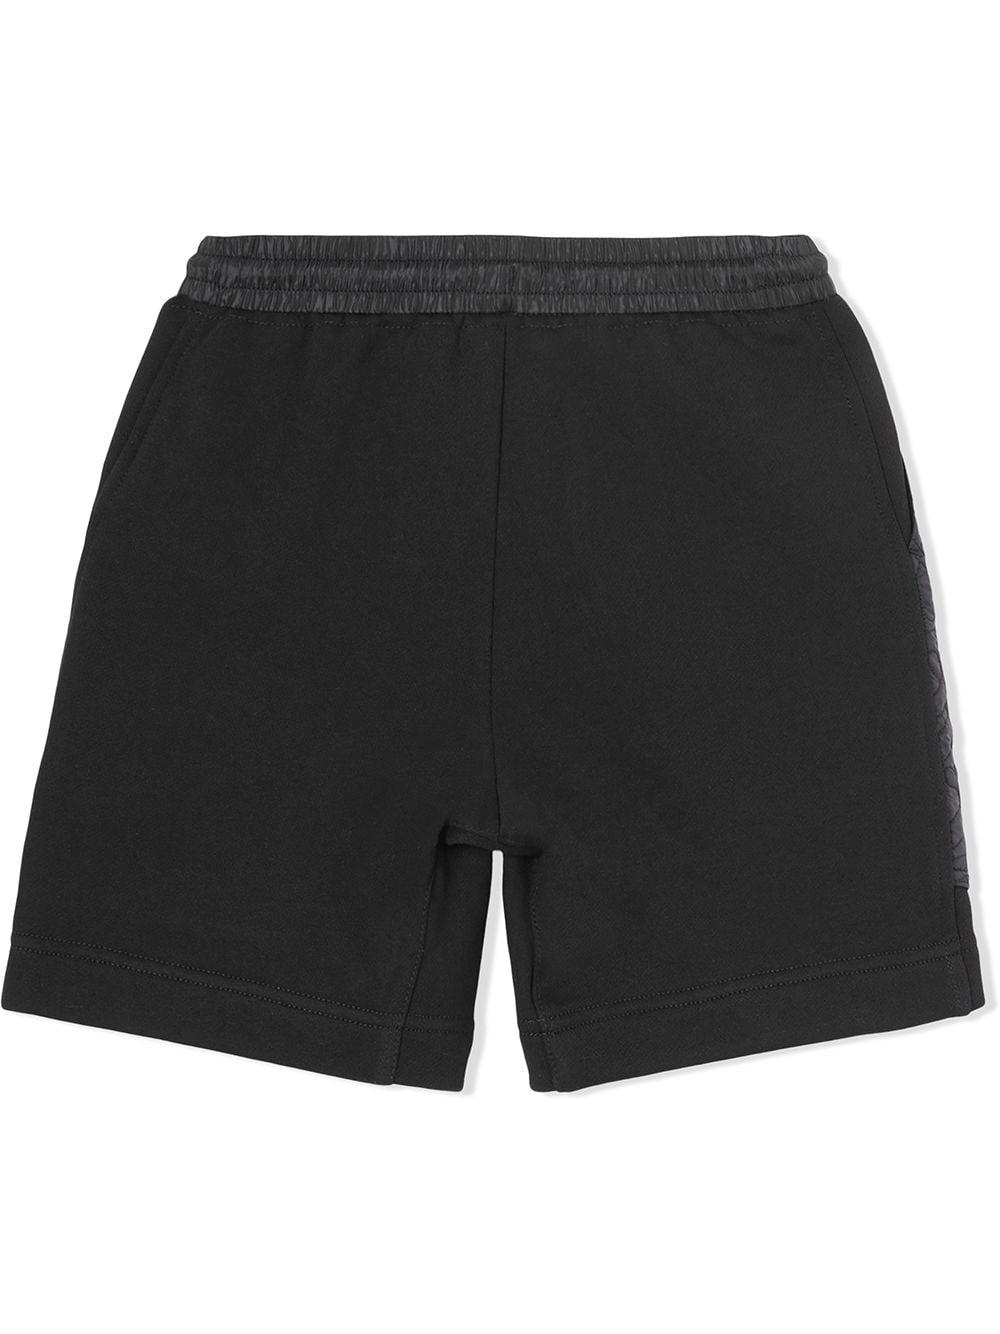 BURBERRY KIDS | Shorts | 8037857A1189#